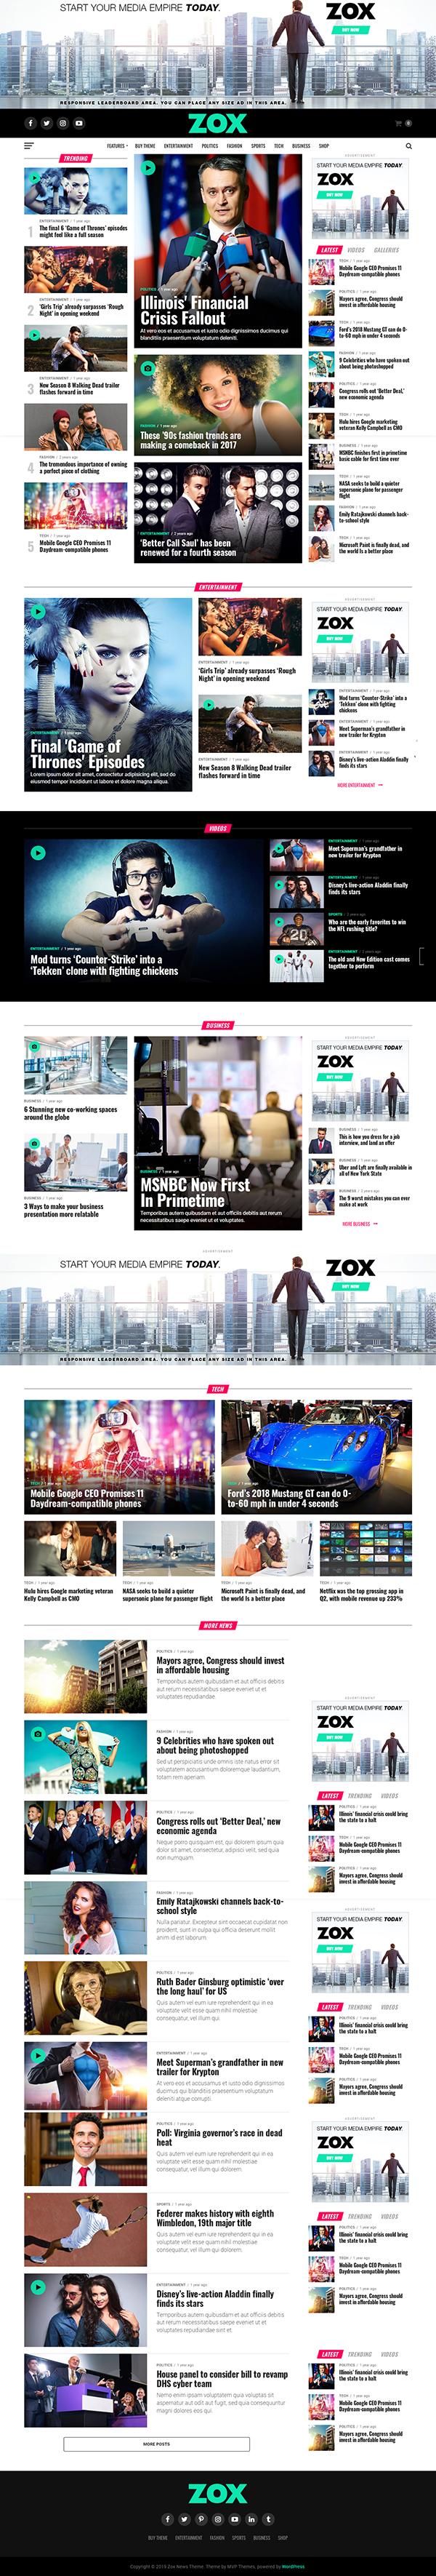 Zox News - Professional WordPress News & Magazine Theme